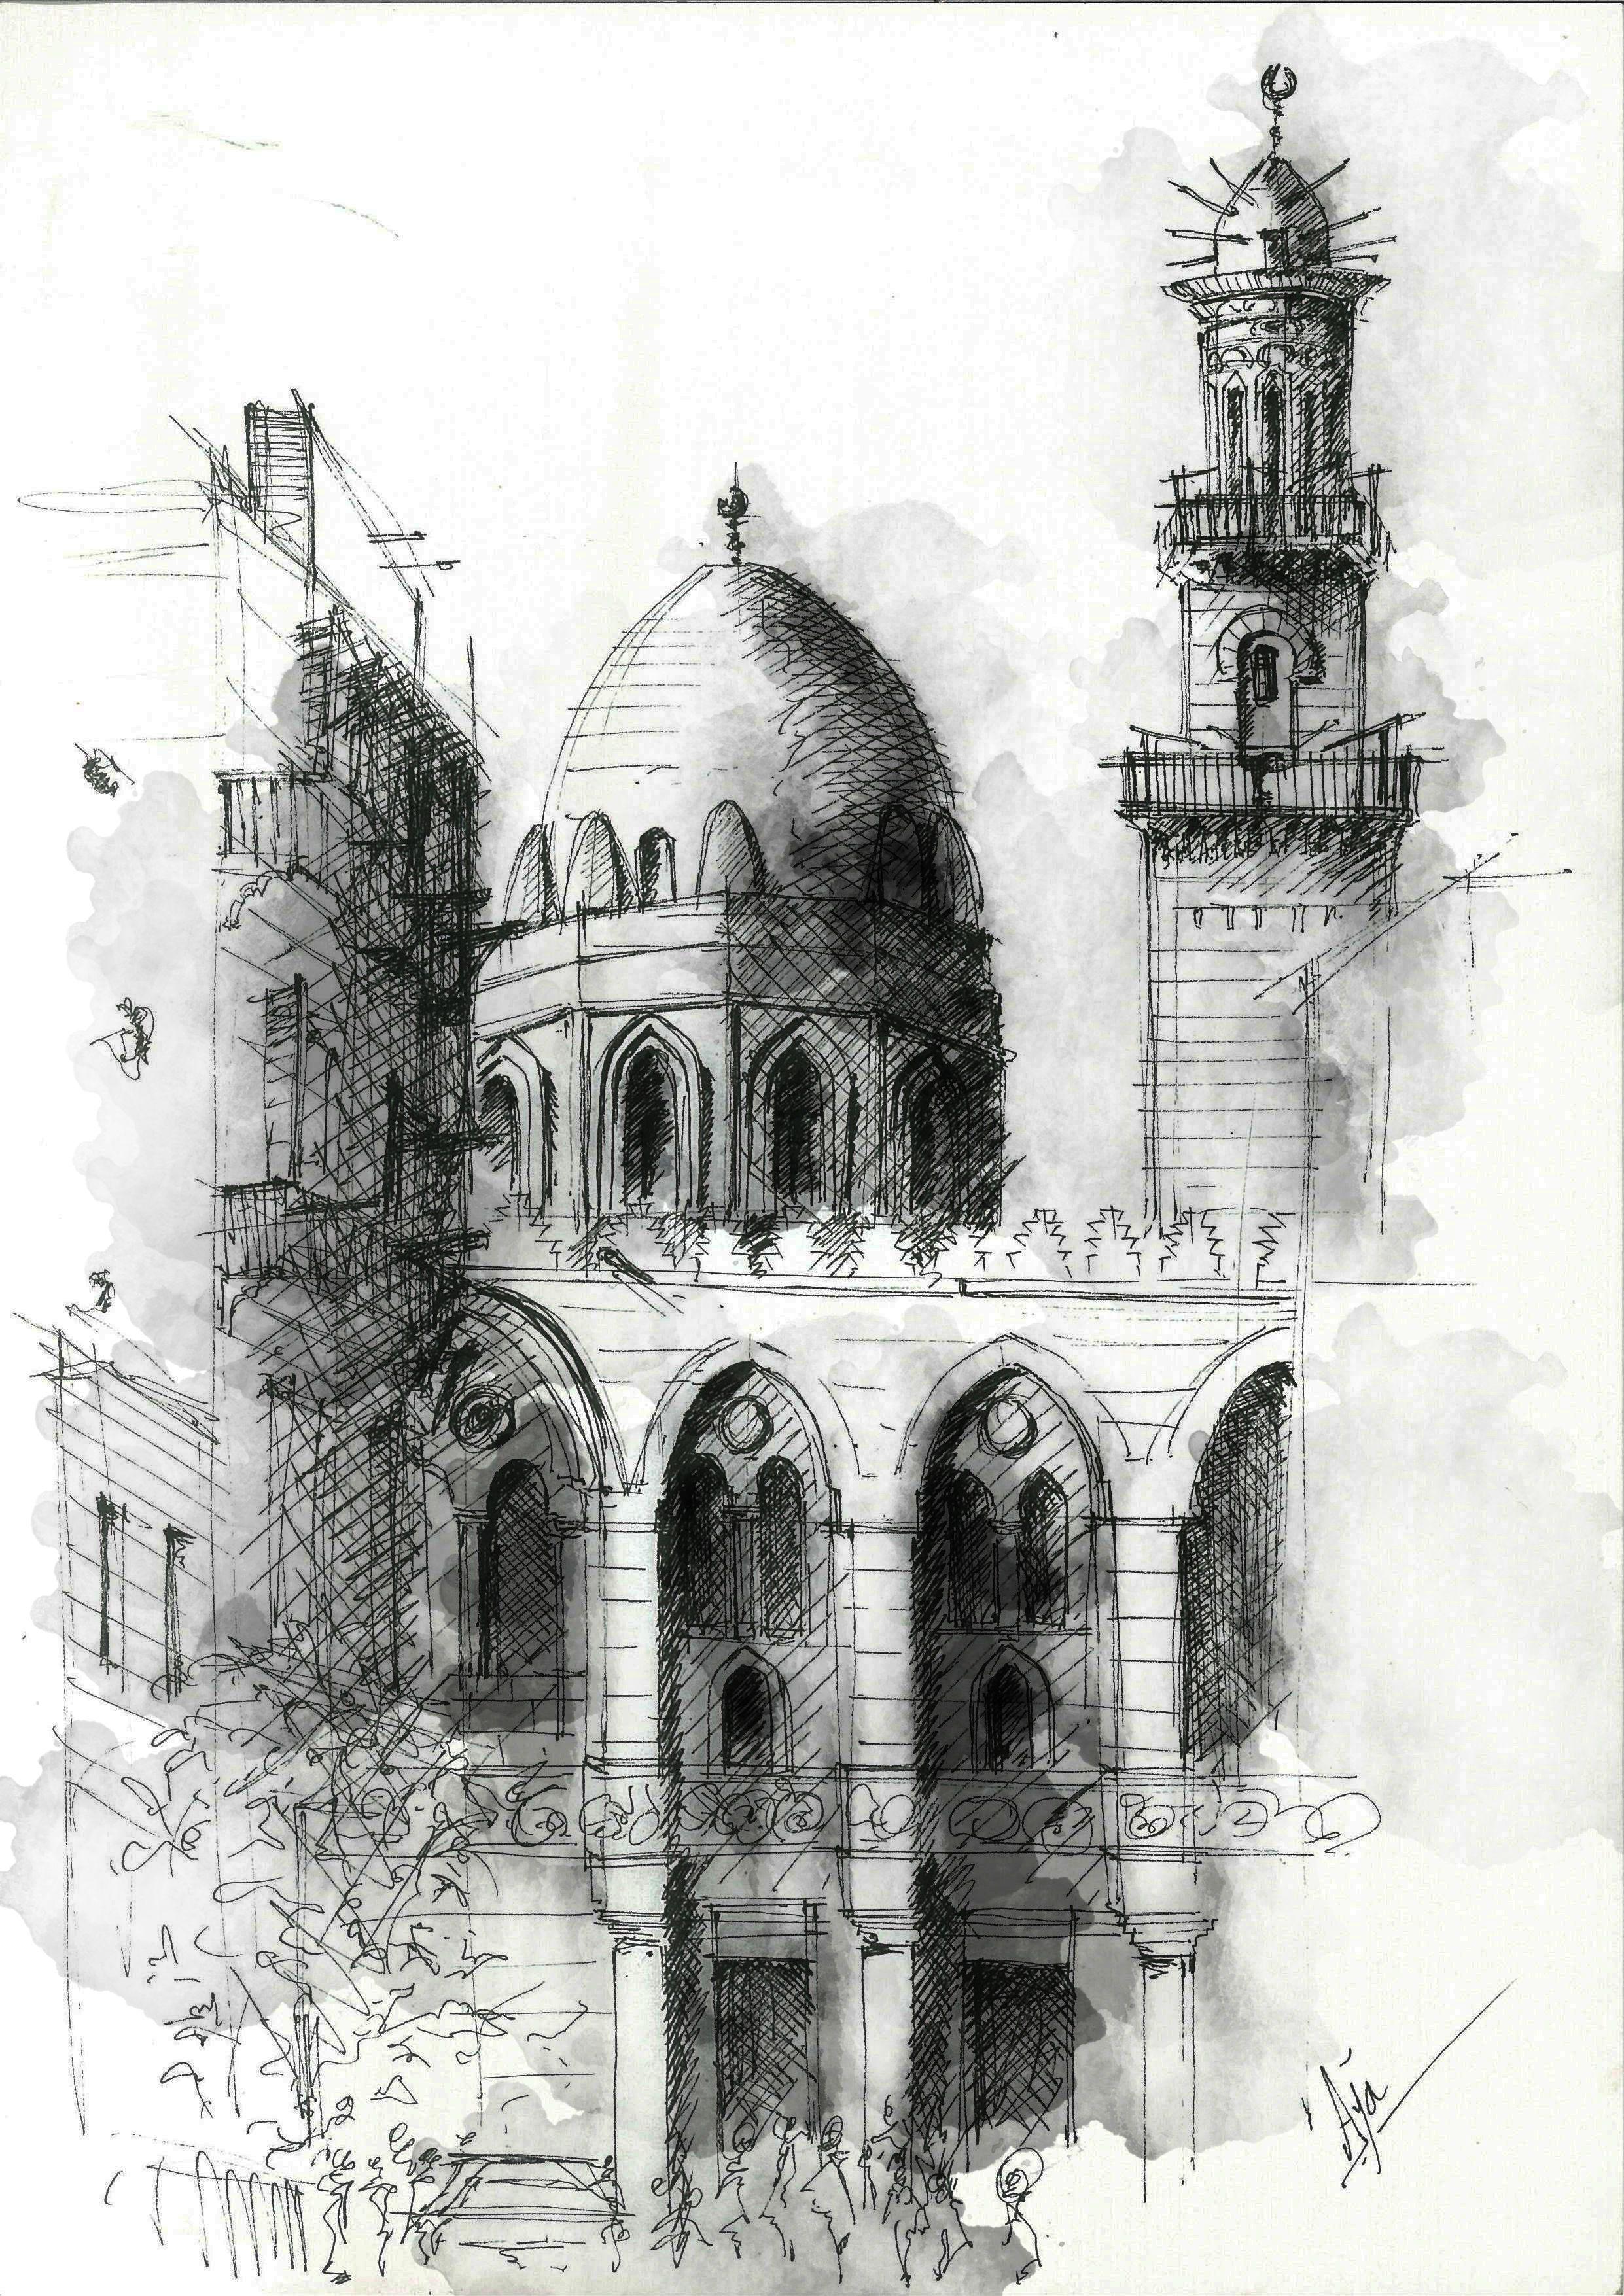 Mausoleum of sultan qalawun located on al mu 39 izz street for Architecture design company in egypt